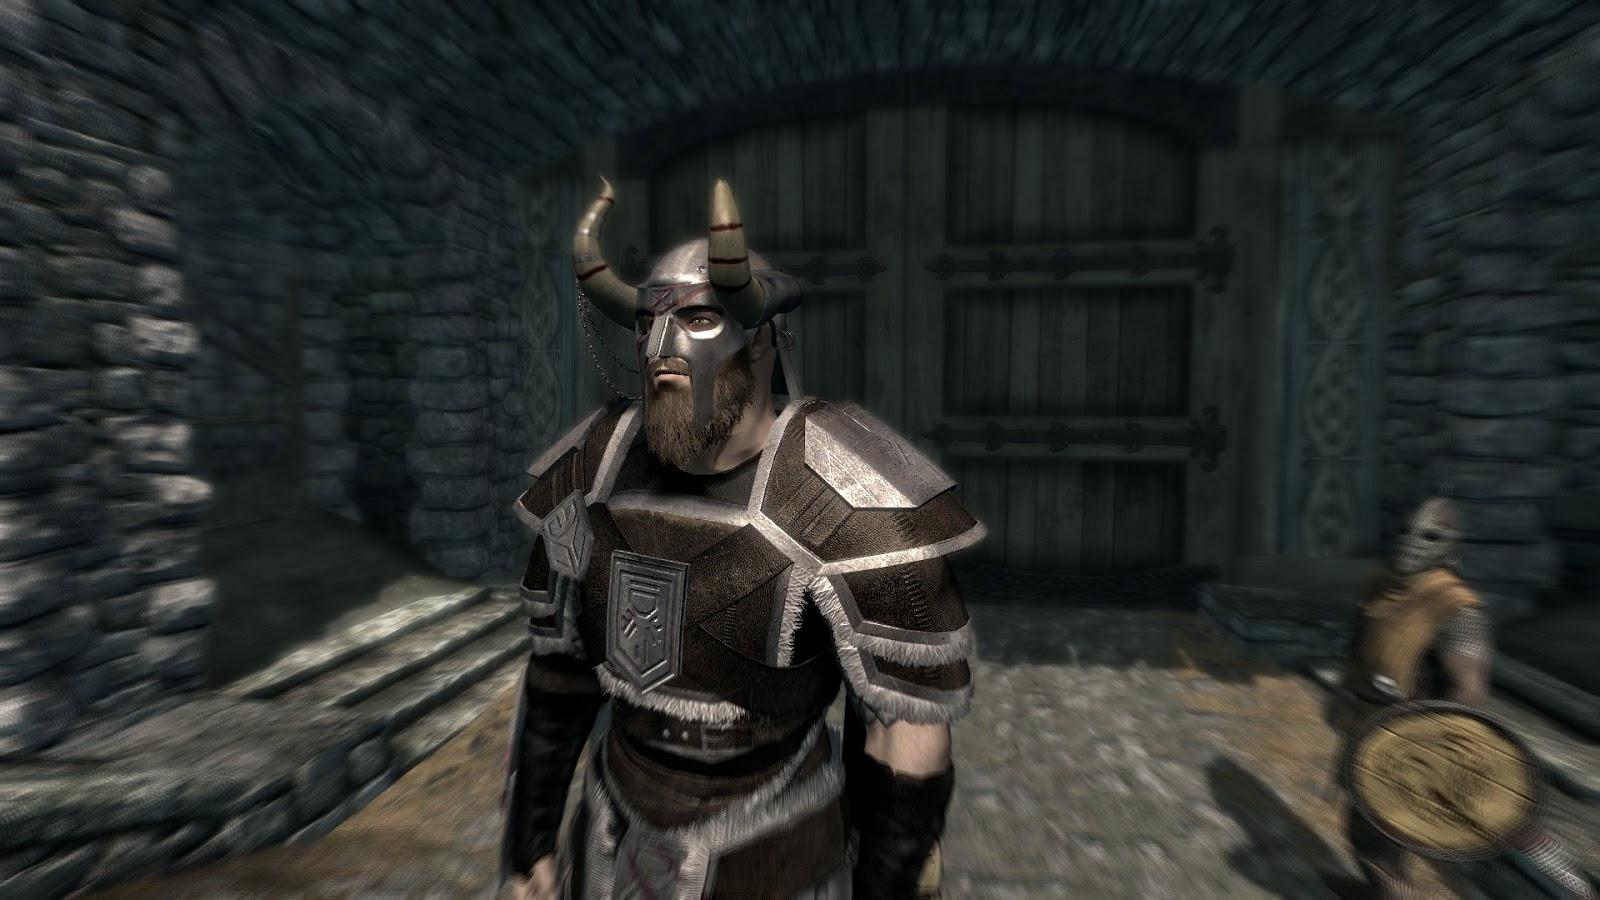 skyrim how to get rid of elder scrolls